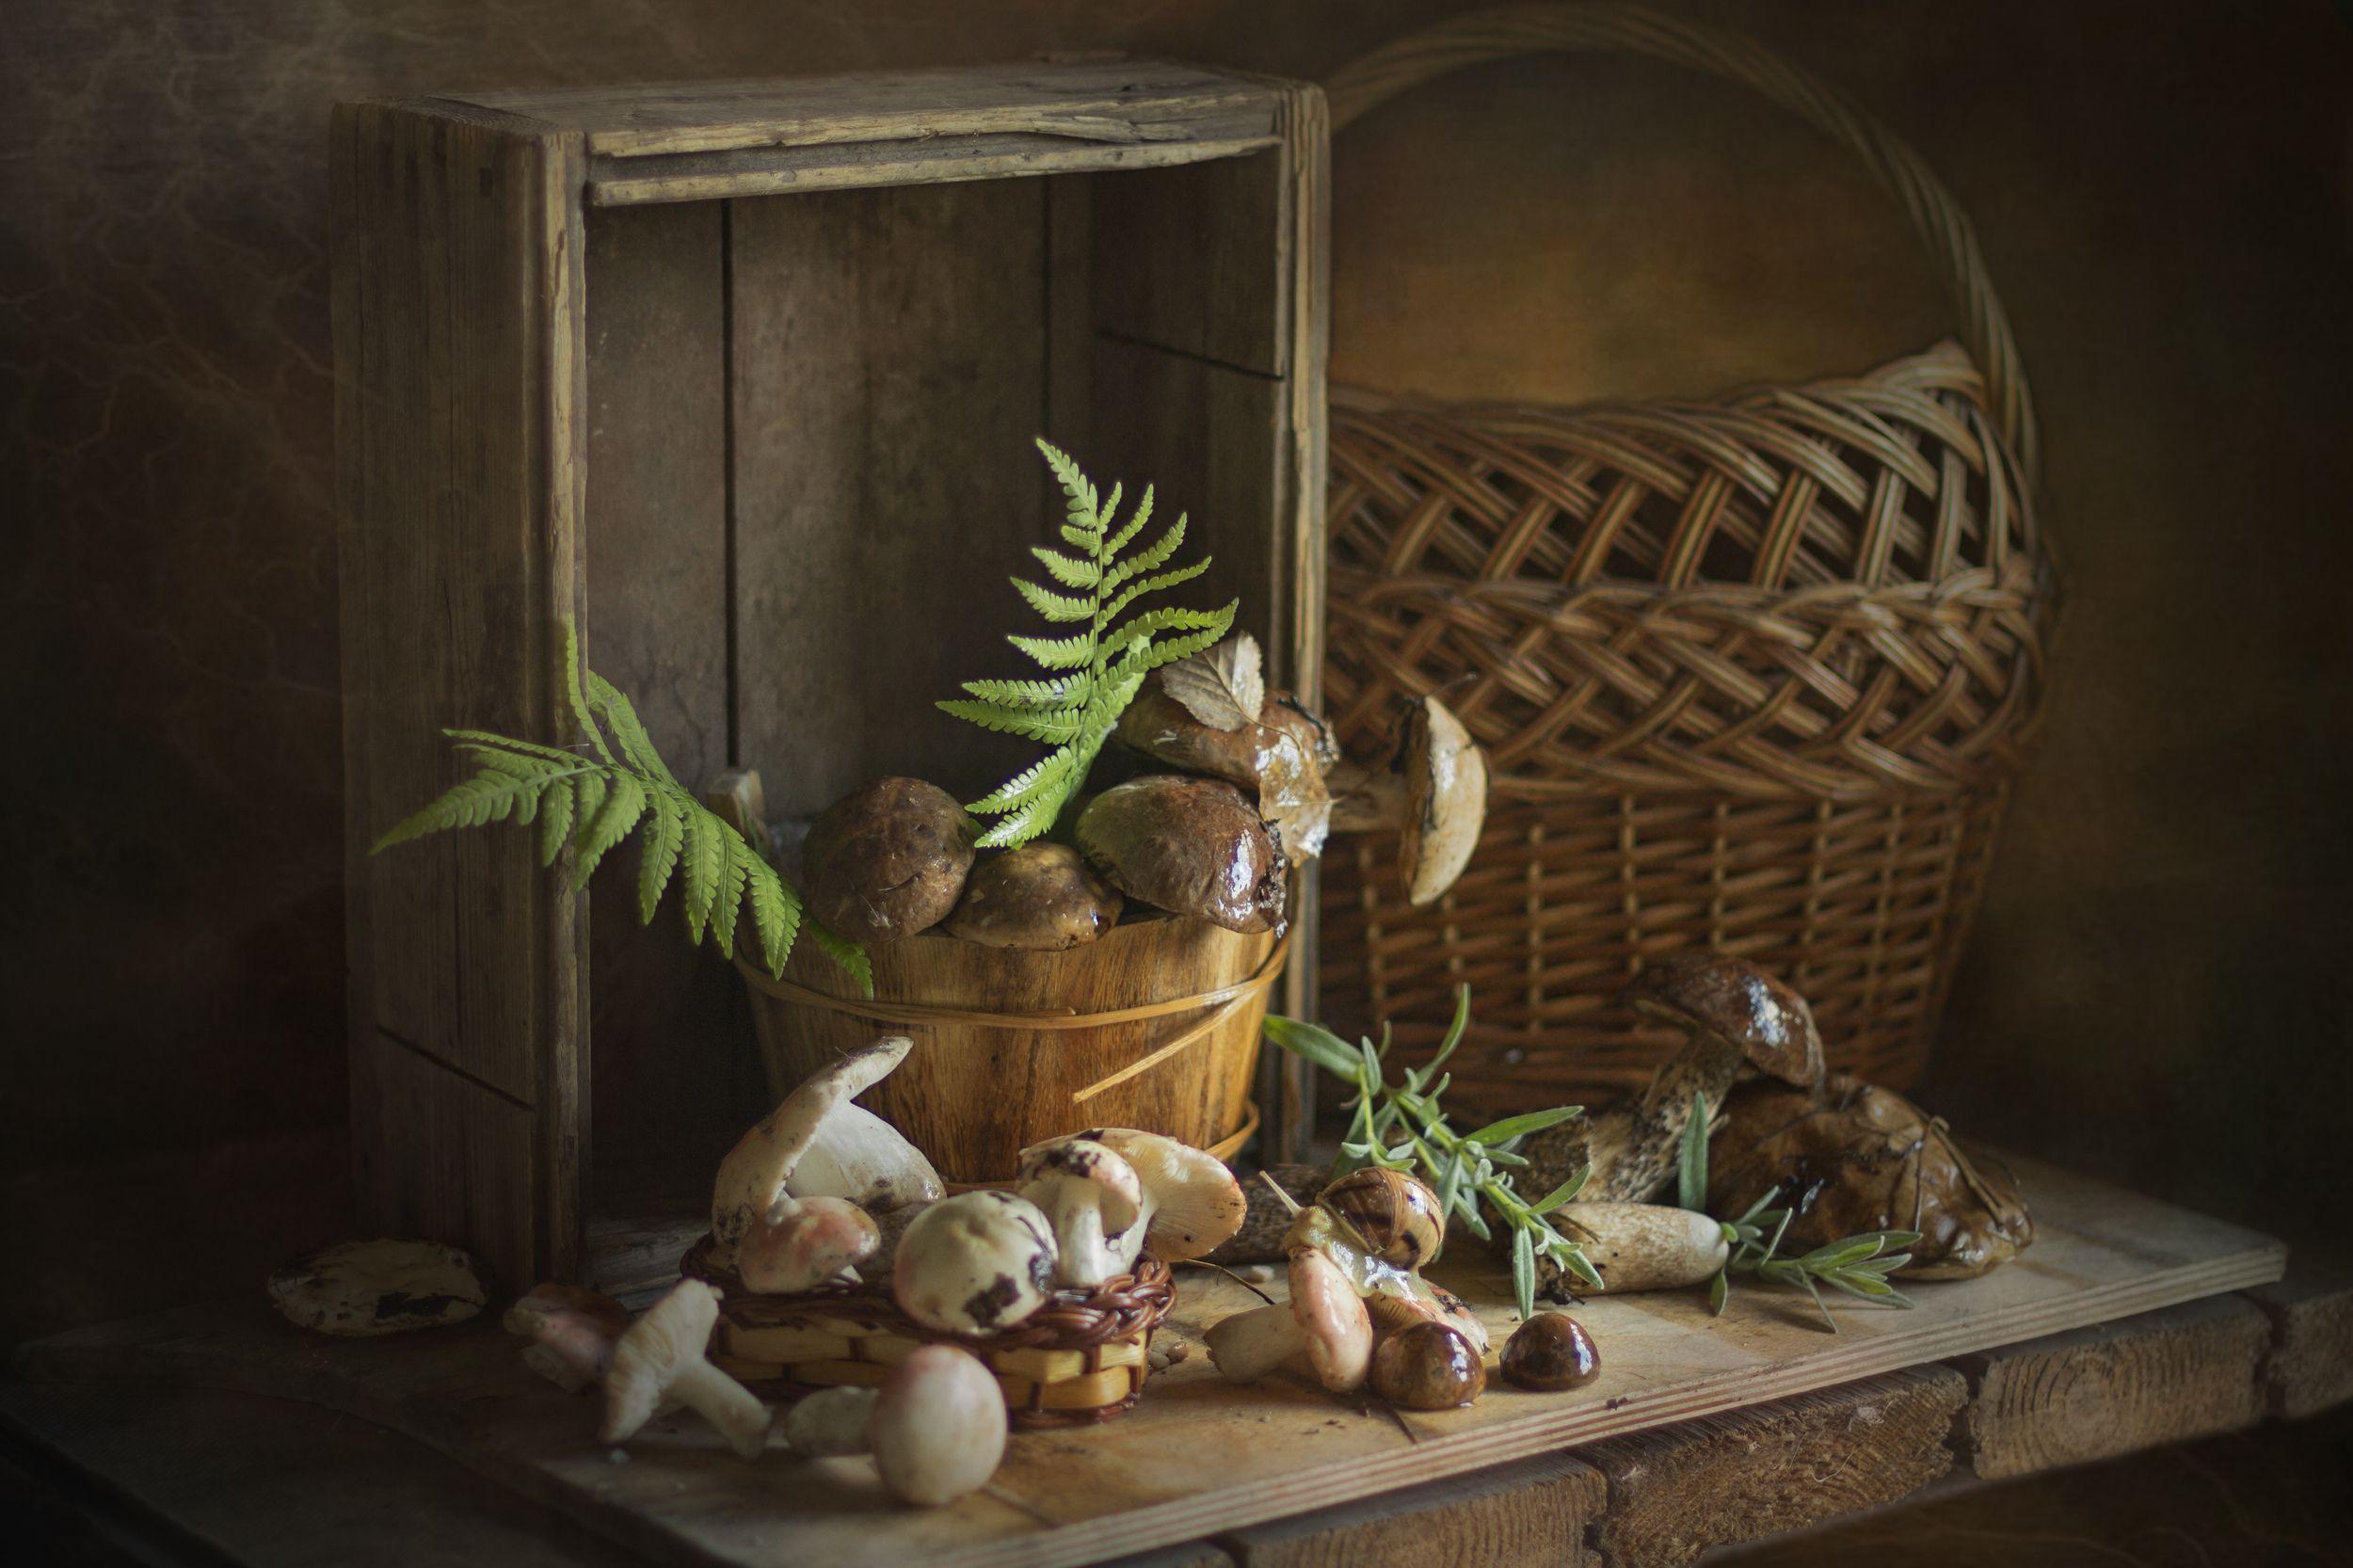 натюрморт, грибы, корзина, лето, лес, Зимина Лионелла